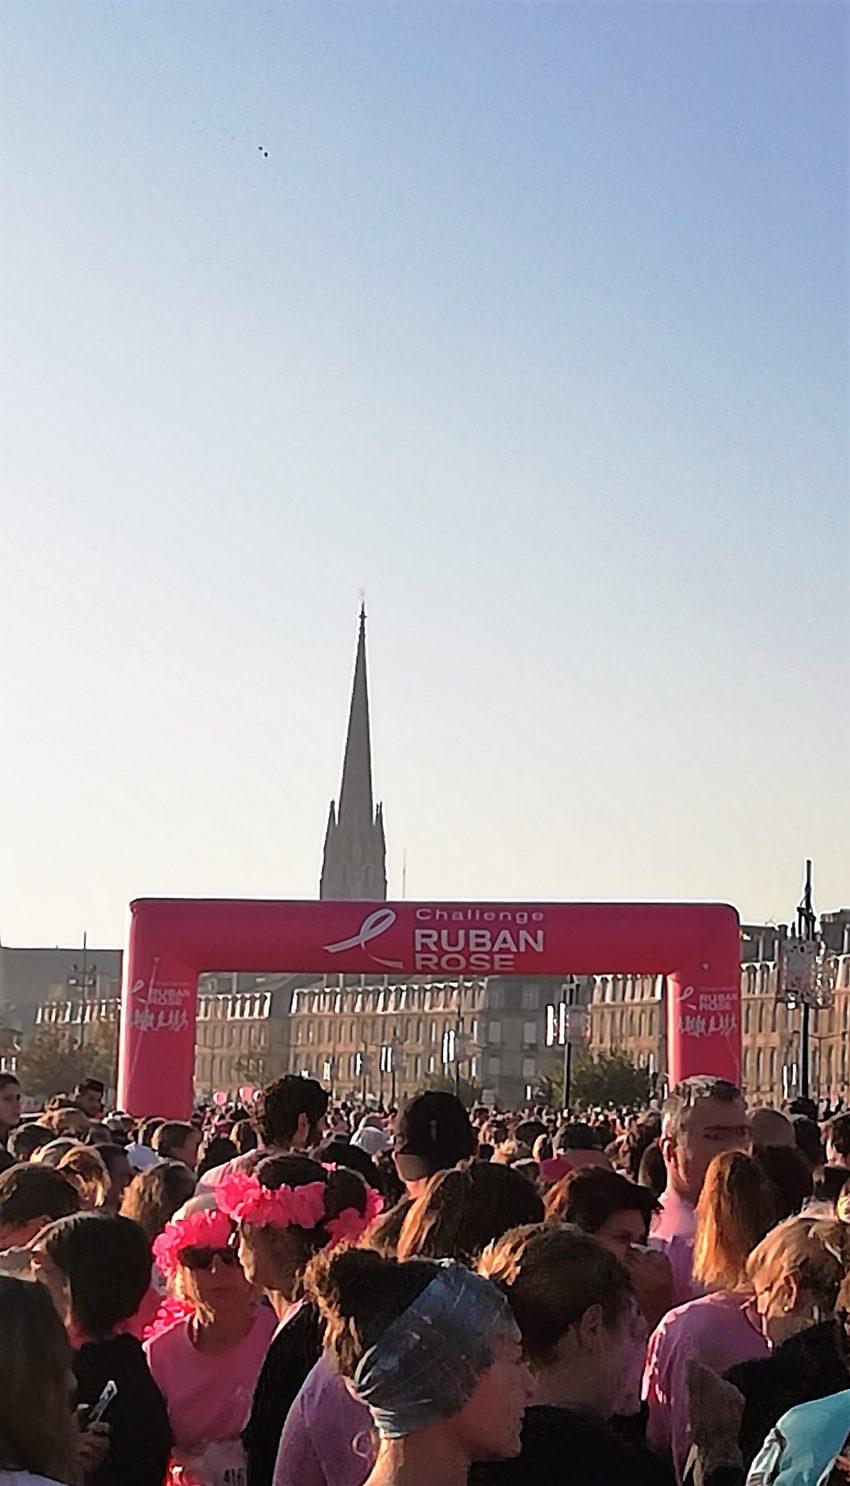 Ruban rose Bordeaux 2018-lesrdvdhelen.com